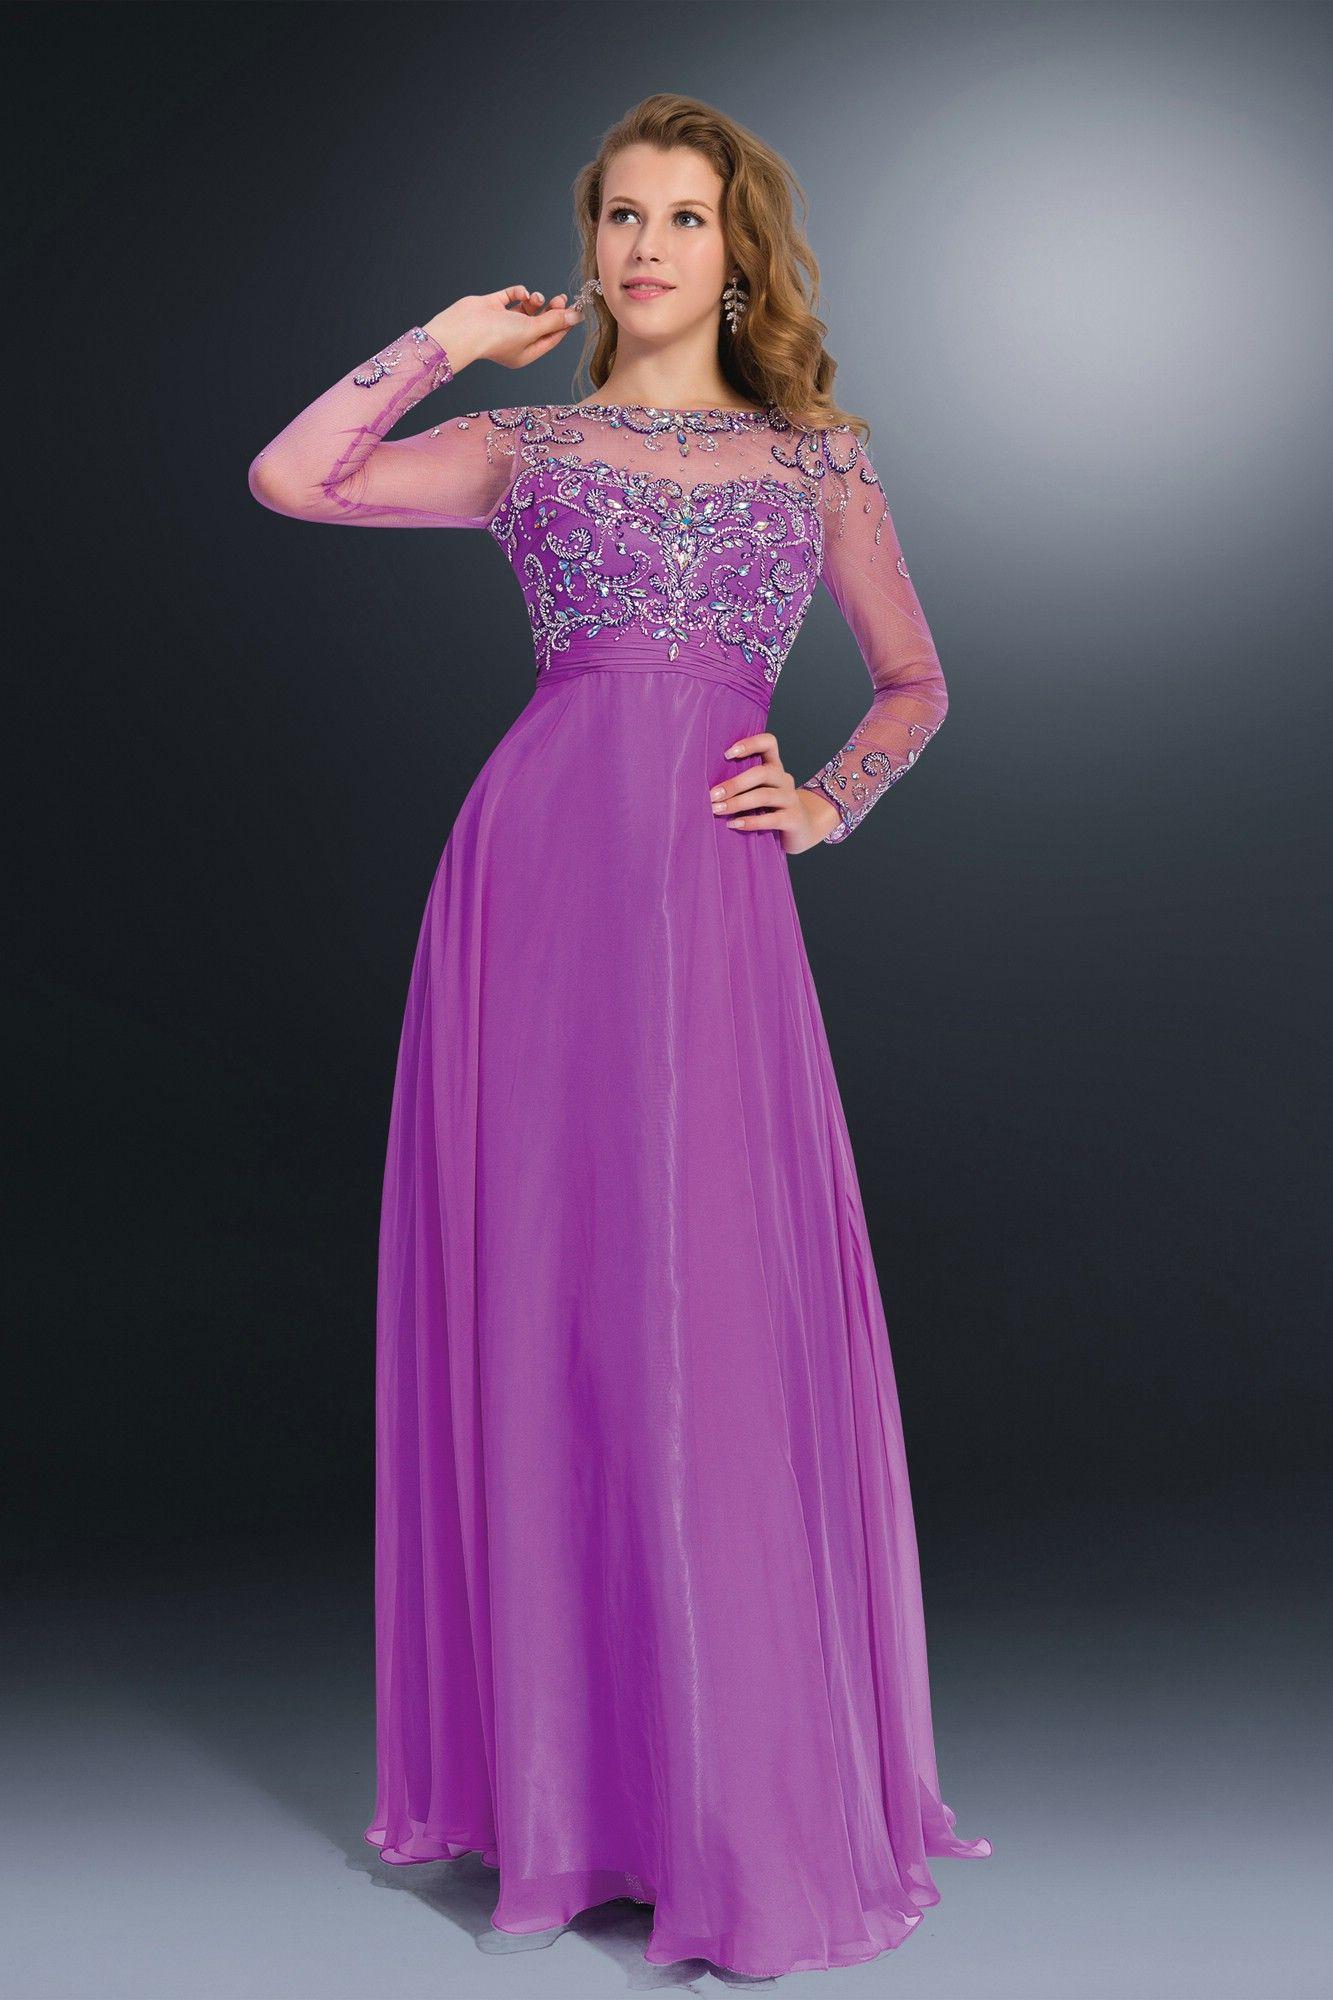 Long sleeves beaded backless purple prom dress | Women's Fashion ...